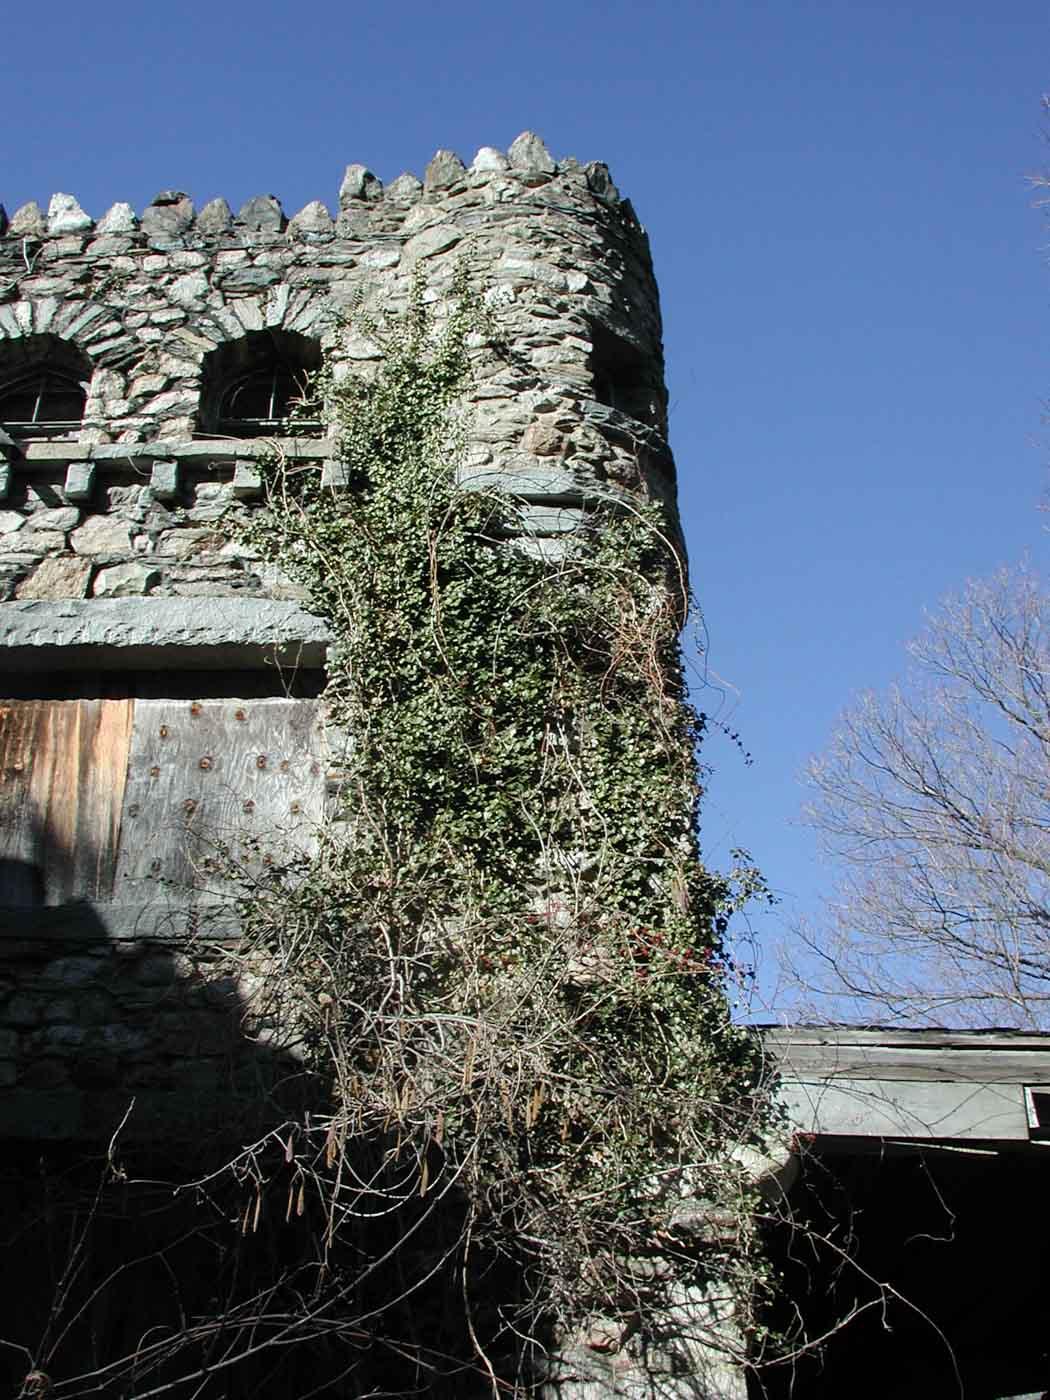 hearthstone-castle-corner-spire-in-ruins